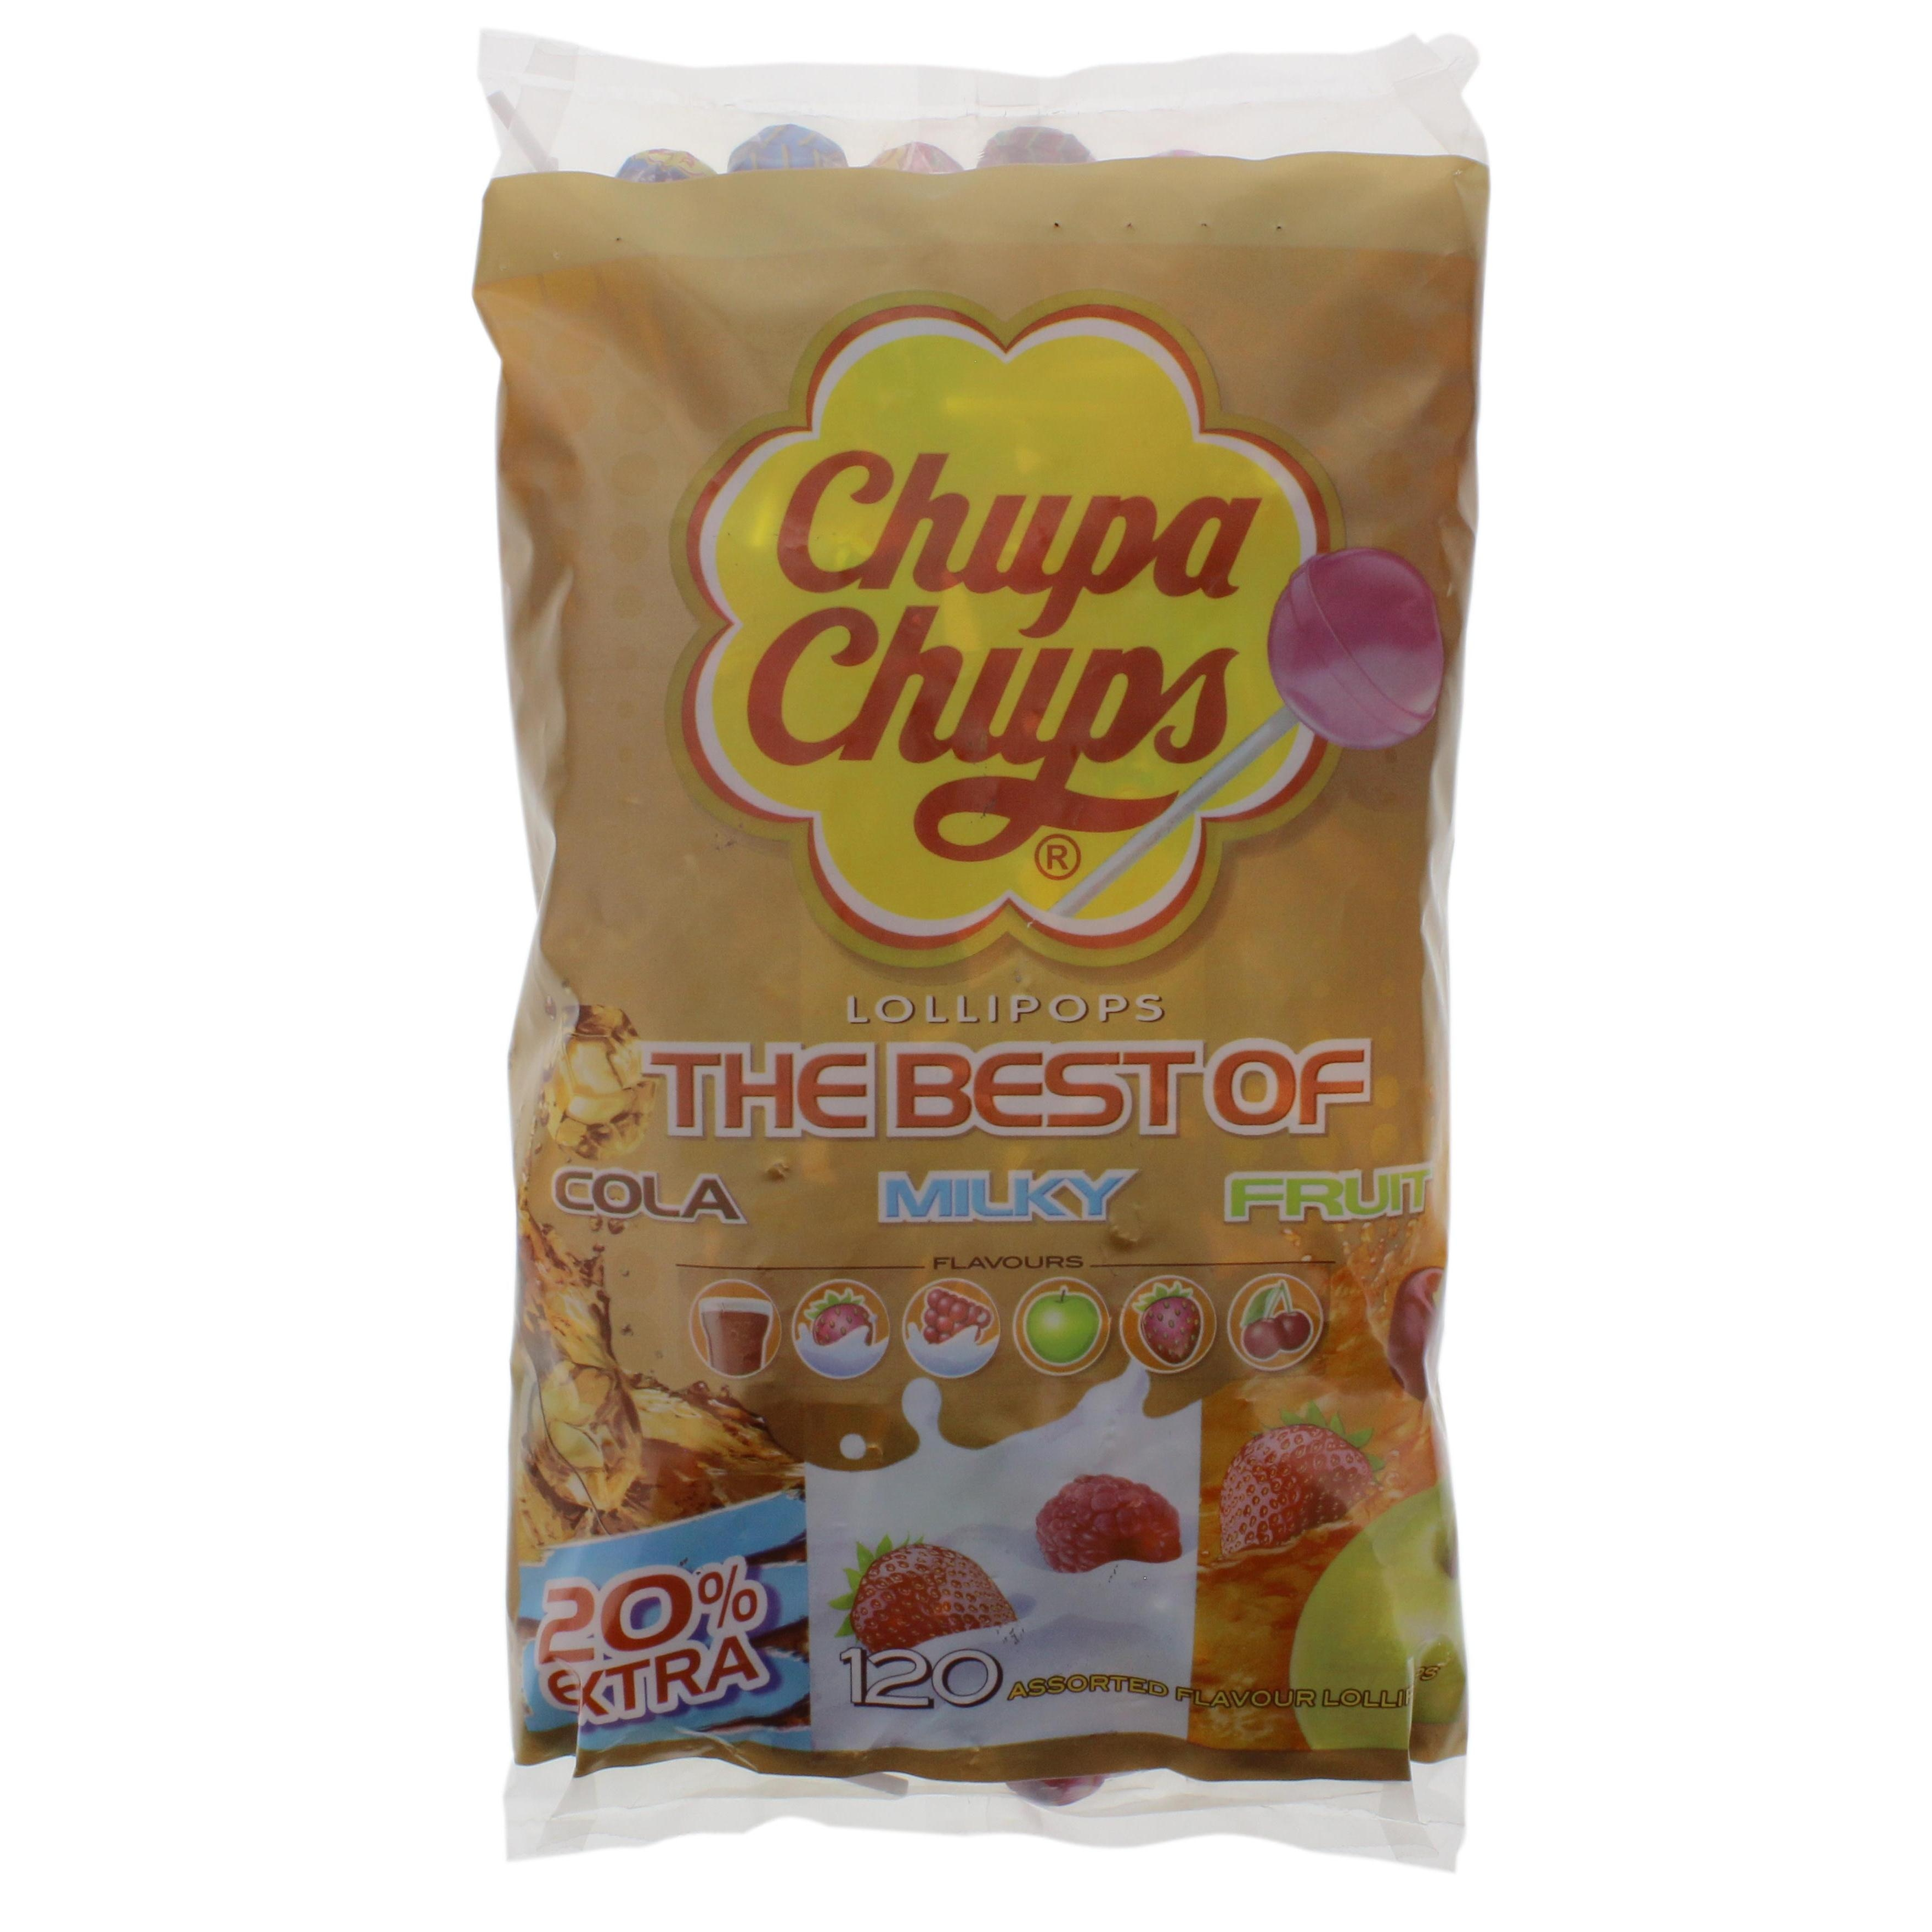 Chupa Chups - The Best Of Nachfüllb. 120St - 1440g